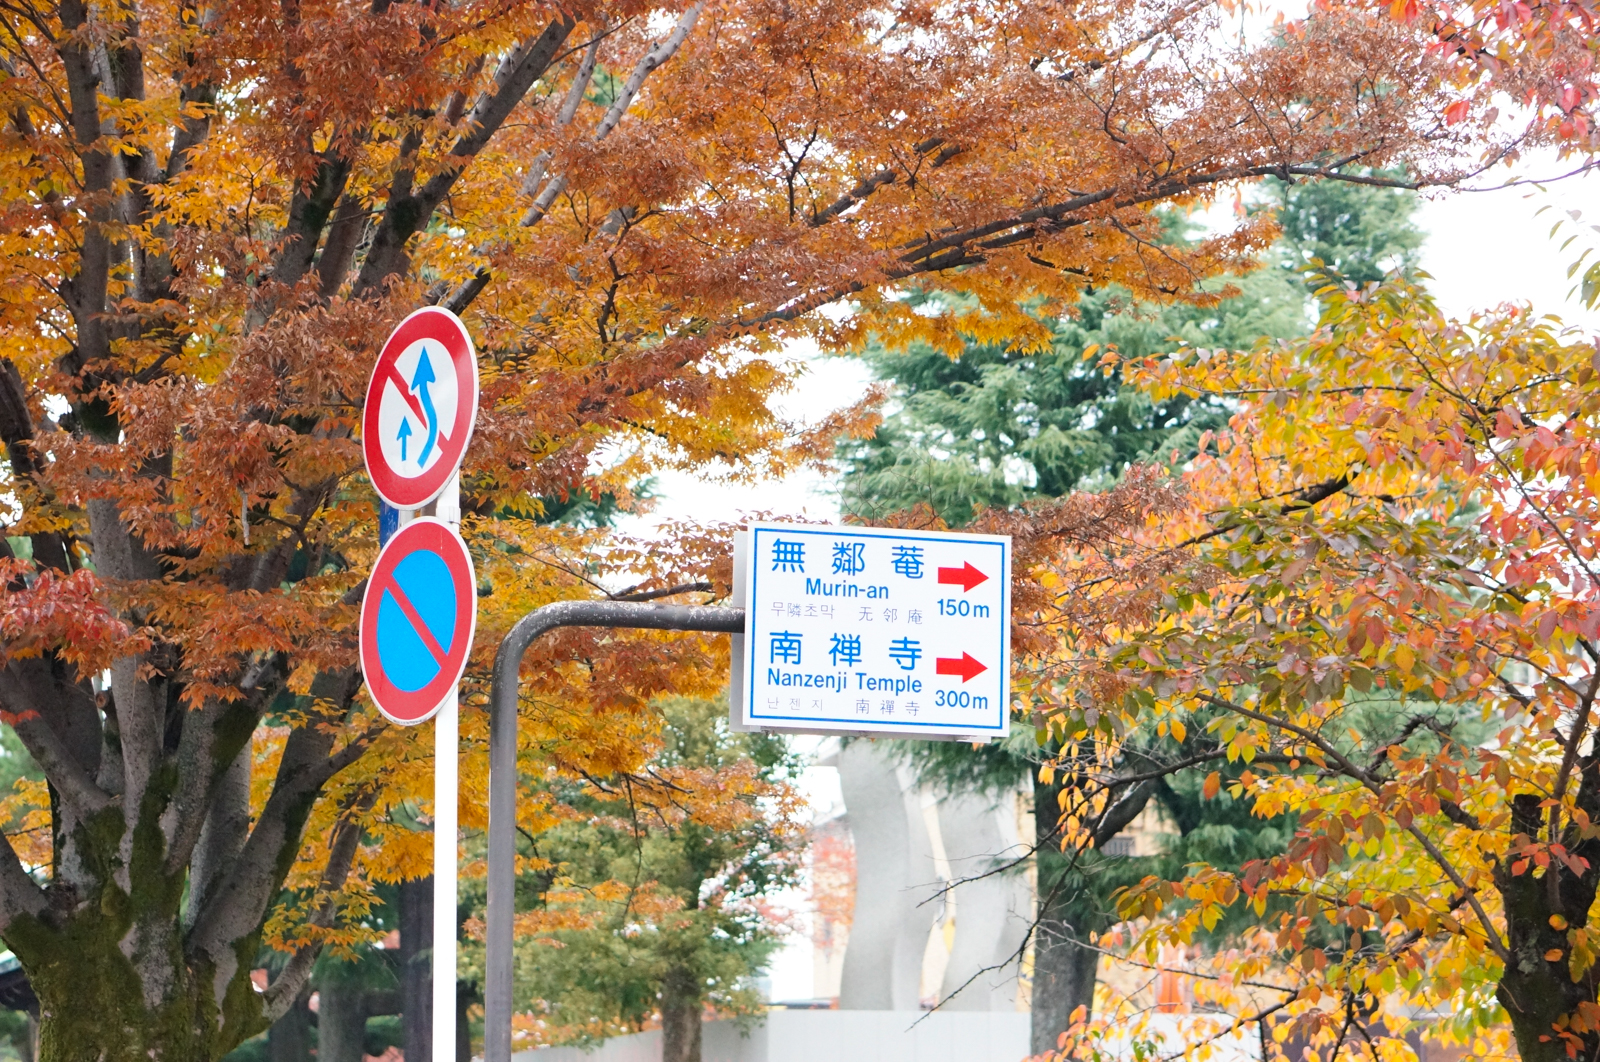 kyoto, kyoto automne, fall kyoto, momiji kyoto, tourisme kyoto, que faire à kyoto, voyage kyoto